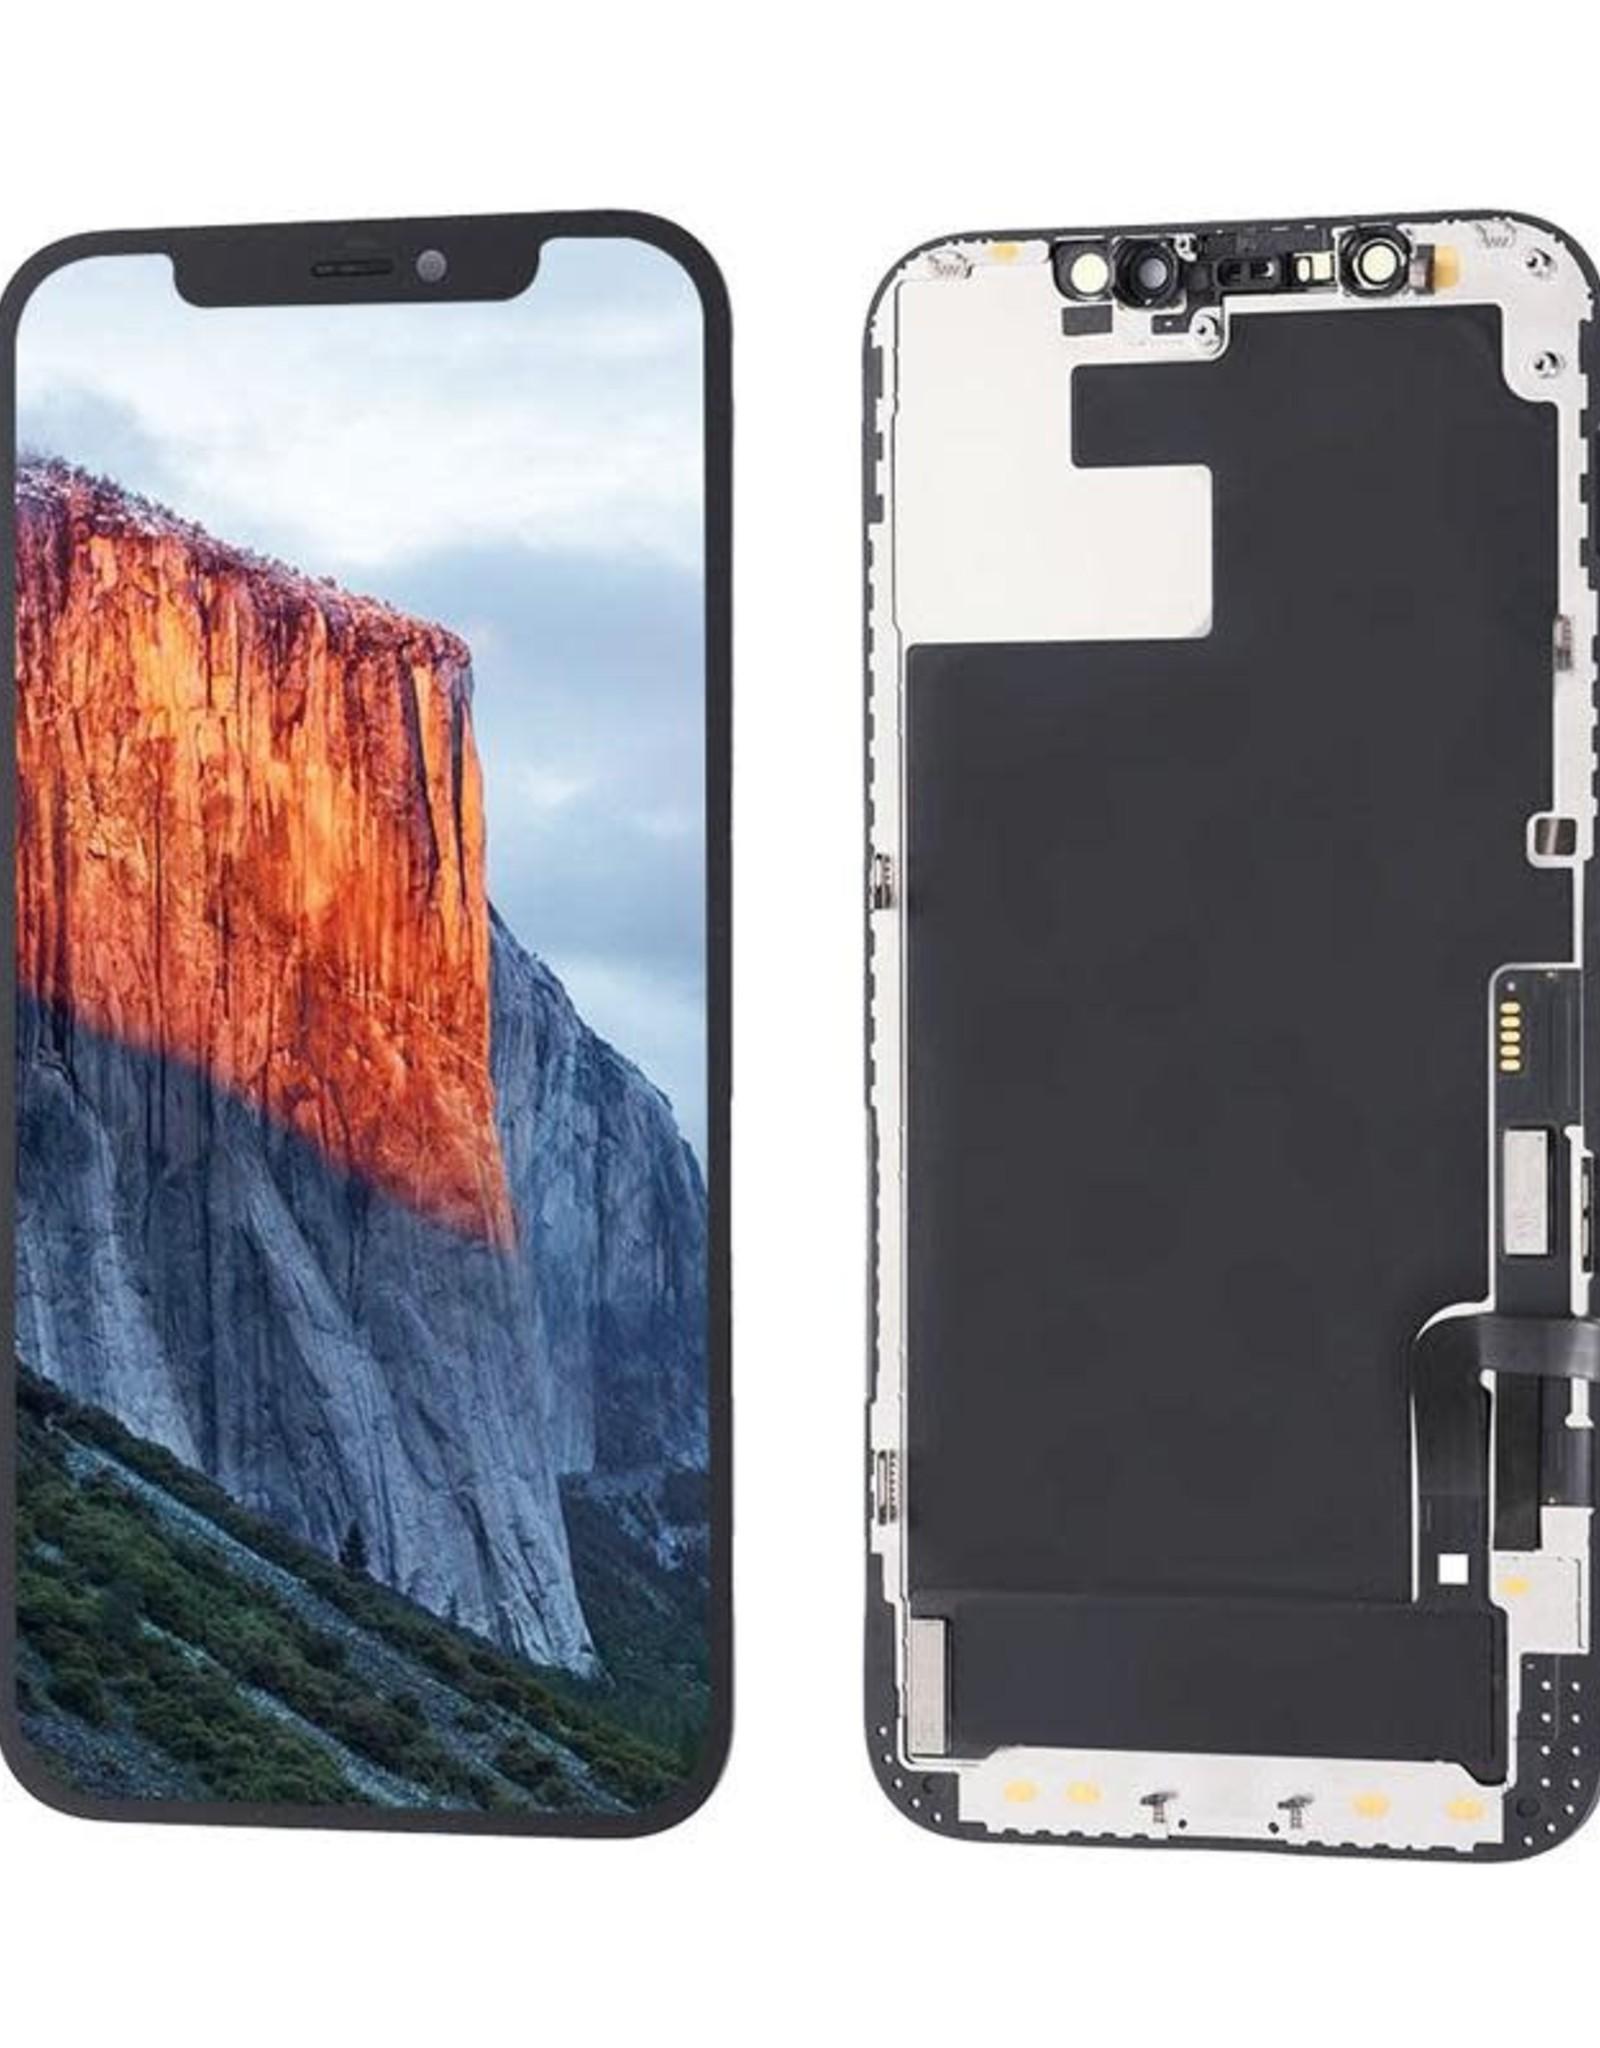 iPhone 12 LCD Mini Screen Replacement